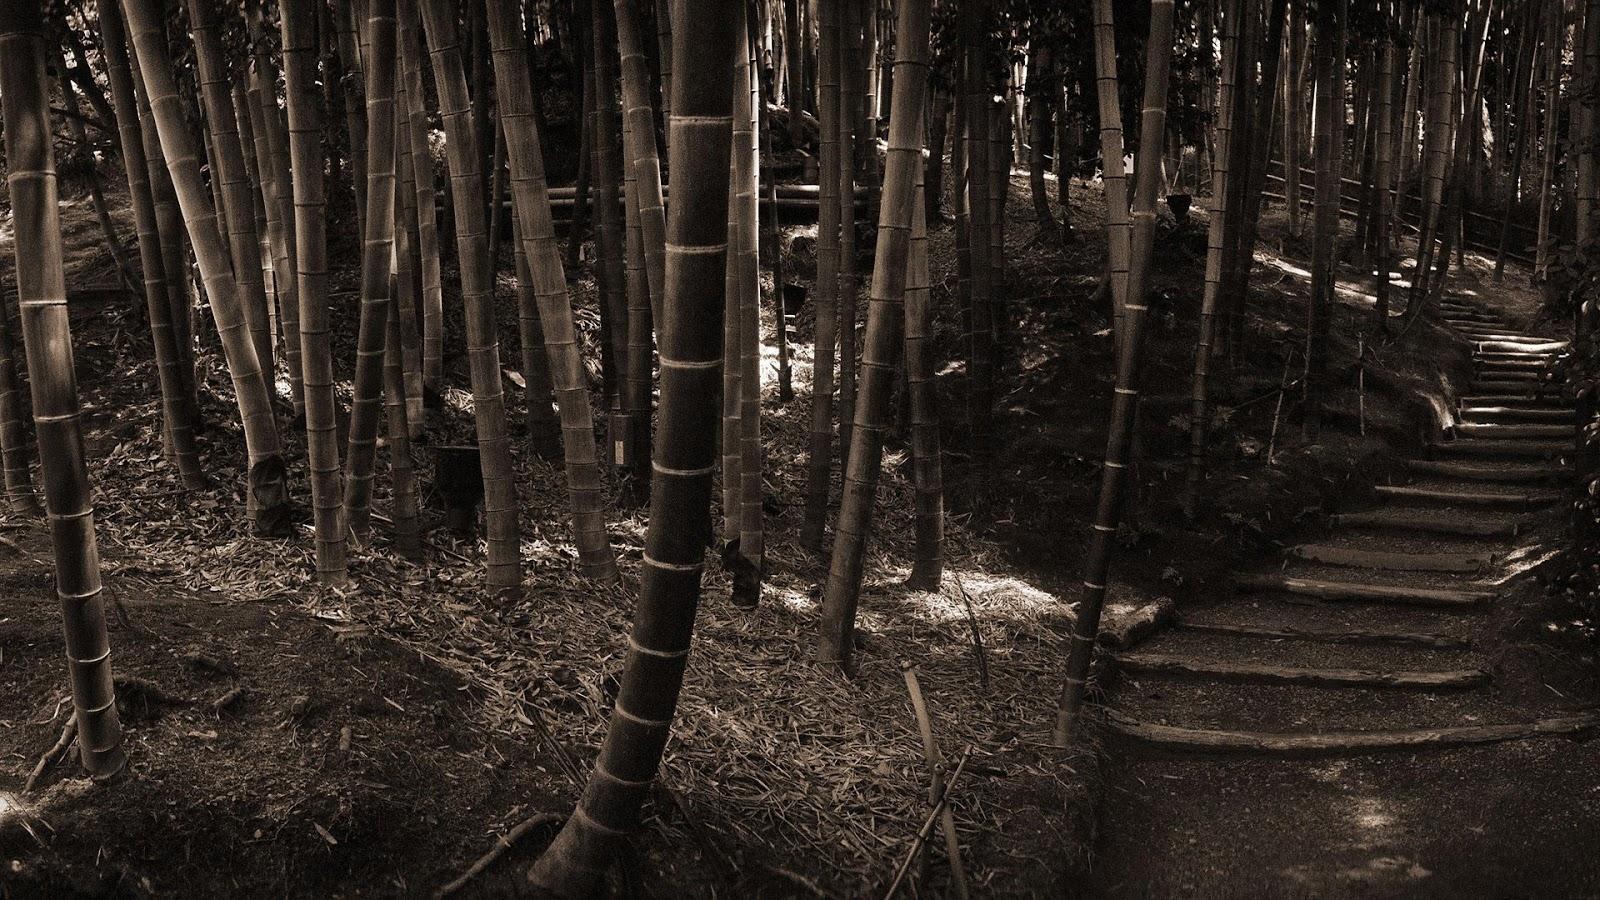 http://4.bp.blogspot.com/-EnmHPtrFl98/UOATGAyD5lI/AAAAAAAAMLo/AtVsaCFVuEk/s1600/bamboo_forest-1080.jpg